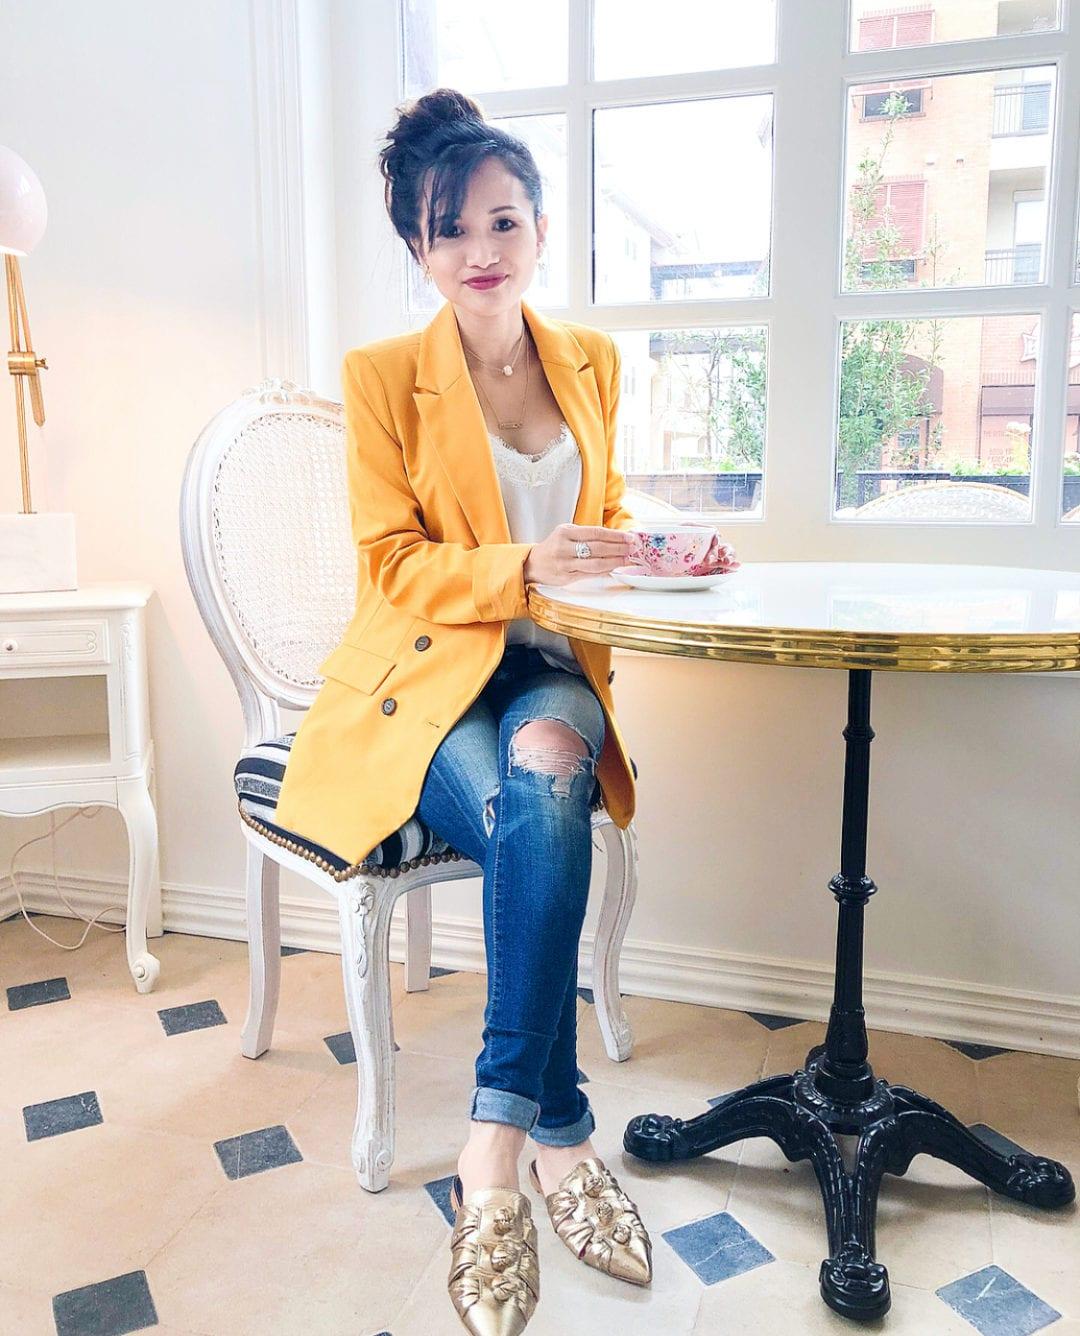 Cafe Poetes, cafes in Houston, Brunch spots in Houston, Houston restaurants, Instagram worthy restaurants, Rebecca mink off mules, yellow blazer, French inspired cafes